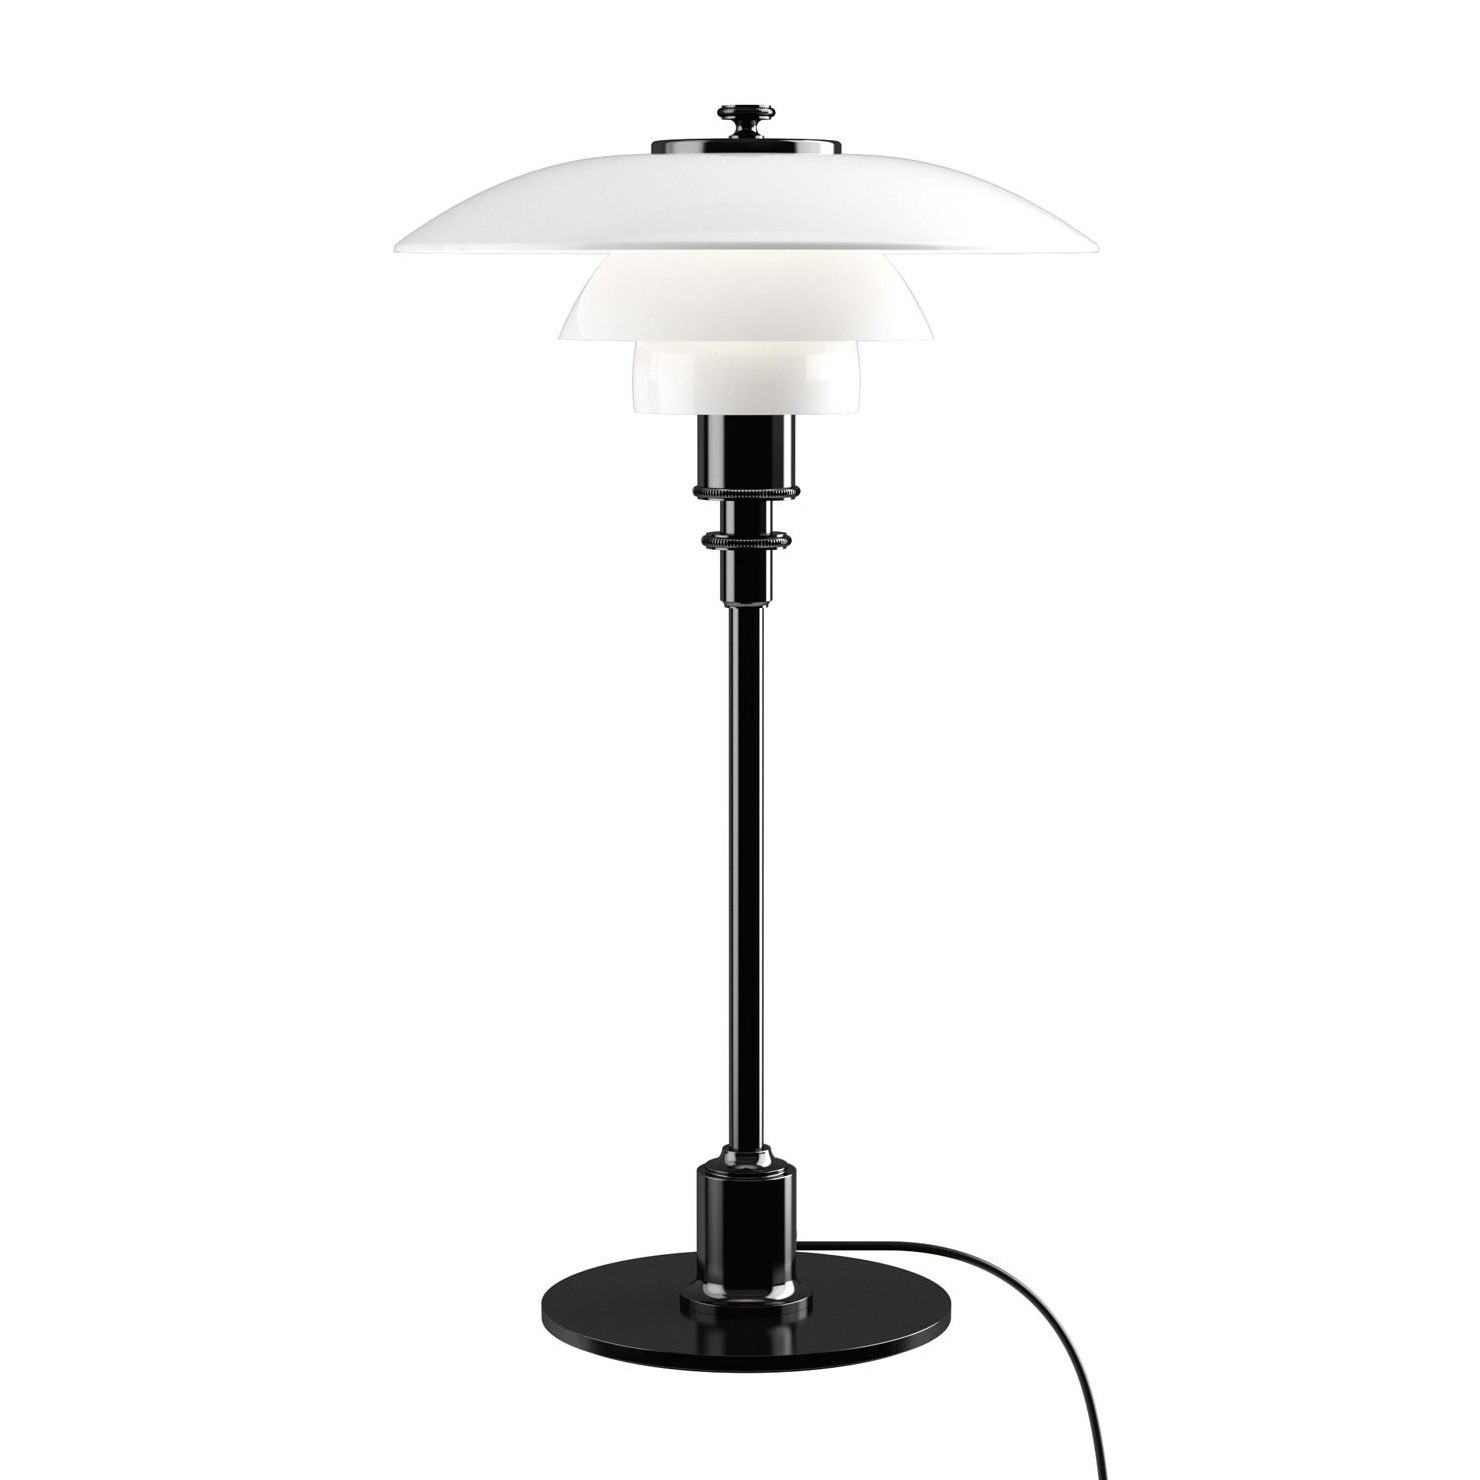 louis poulsen ph 2 1 table lamp ambientedirect. Black Bedroom Furniture Sets. Home Design Ideas